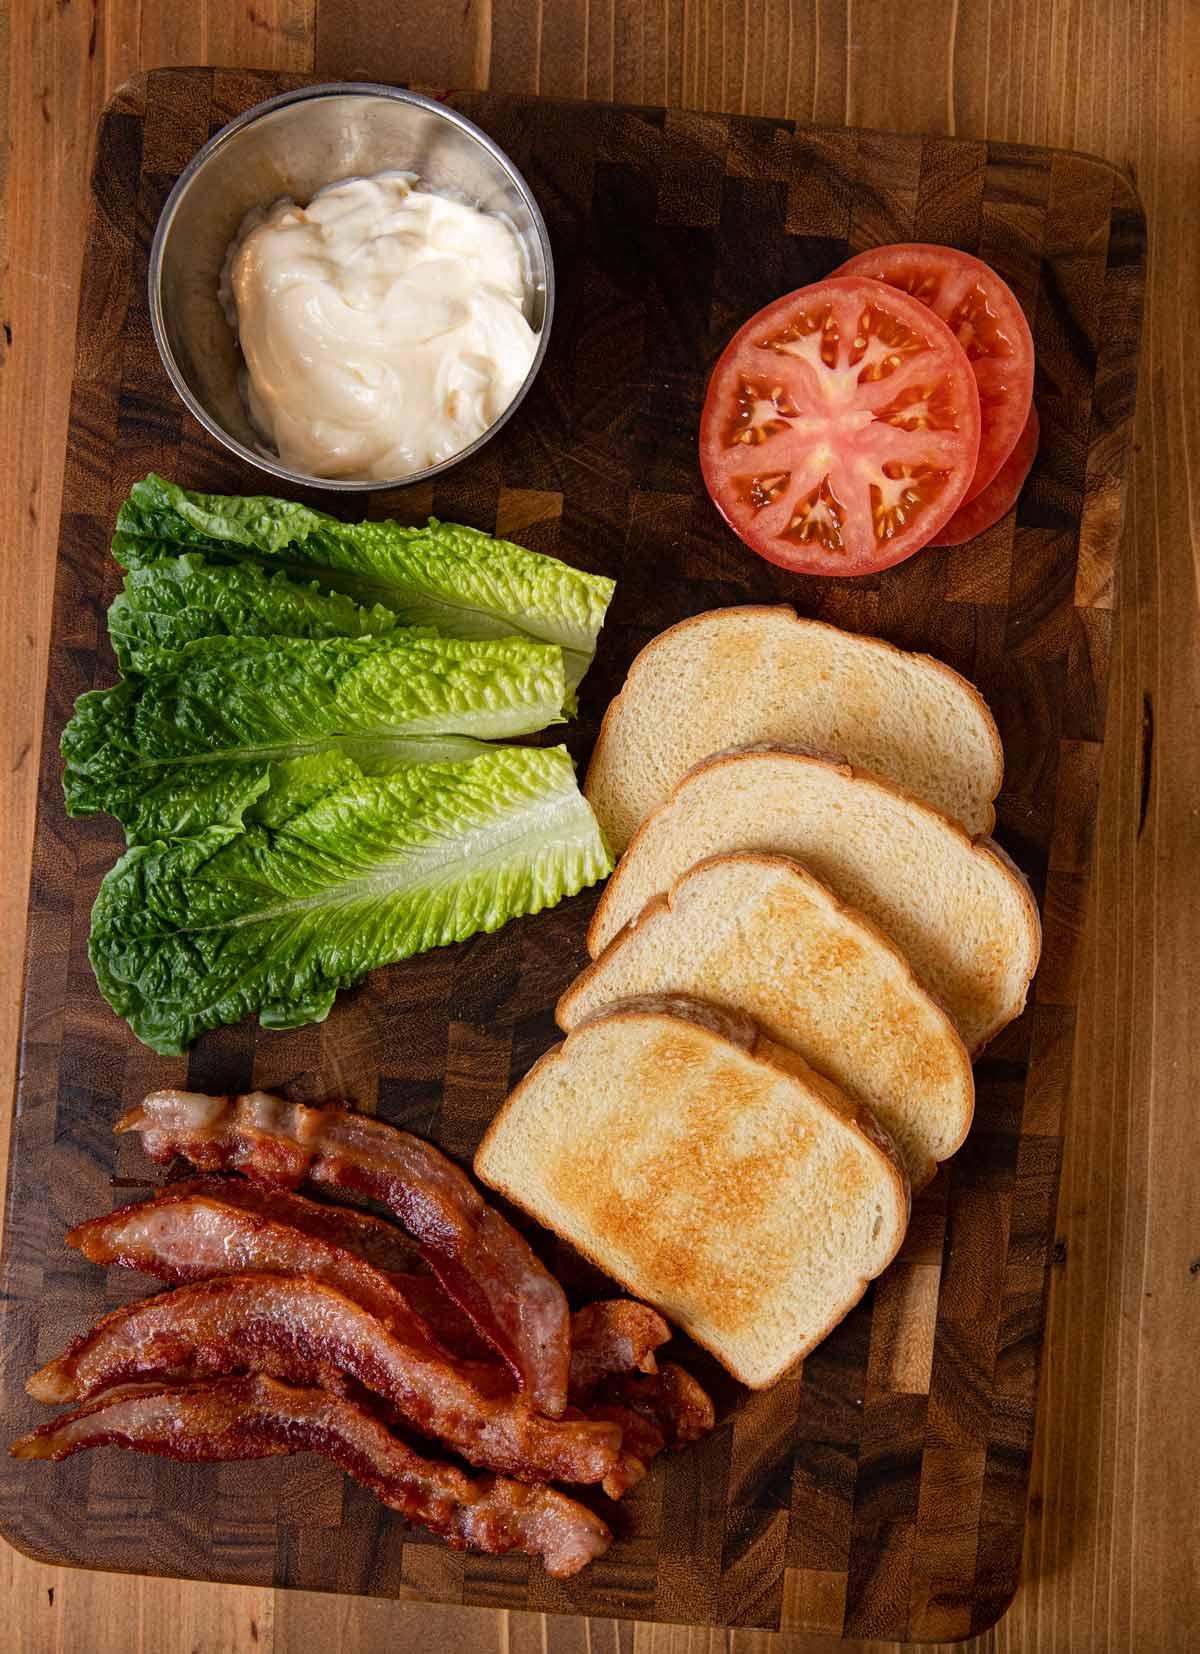 BLT Sandwich ingredients on cutting board